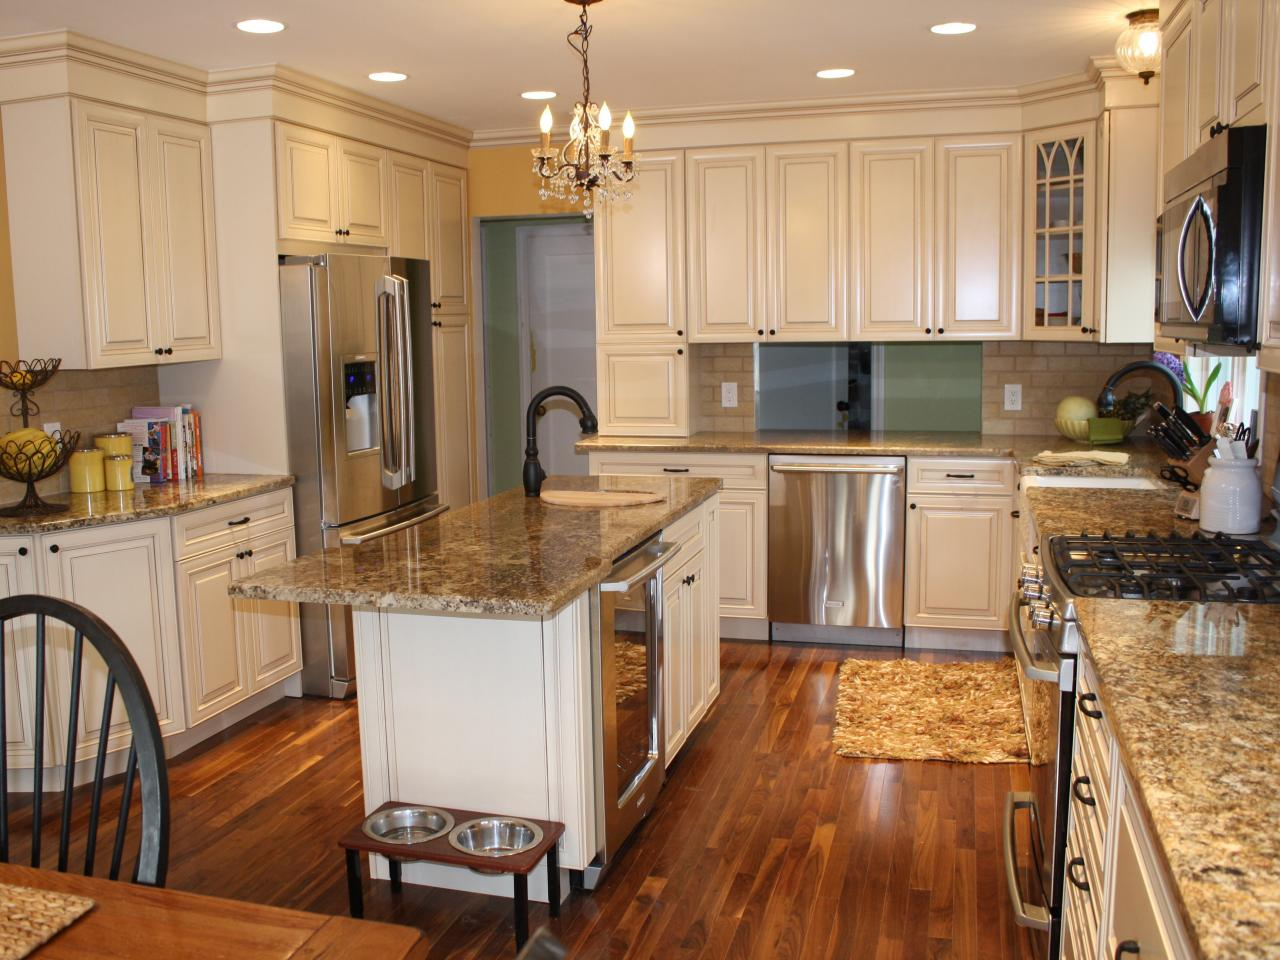 kitchen renovation ideas kitchen after WUYWPTB